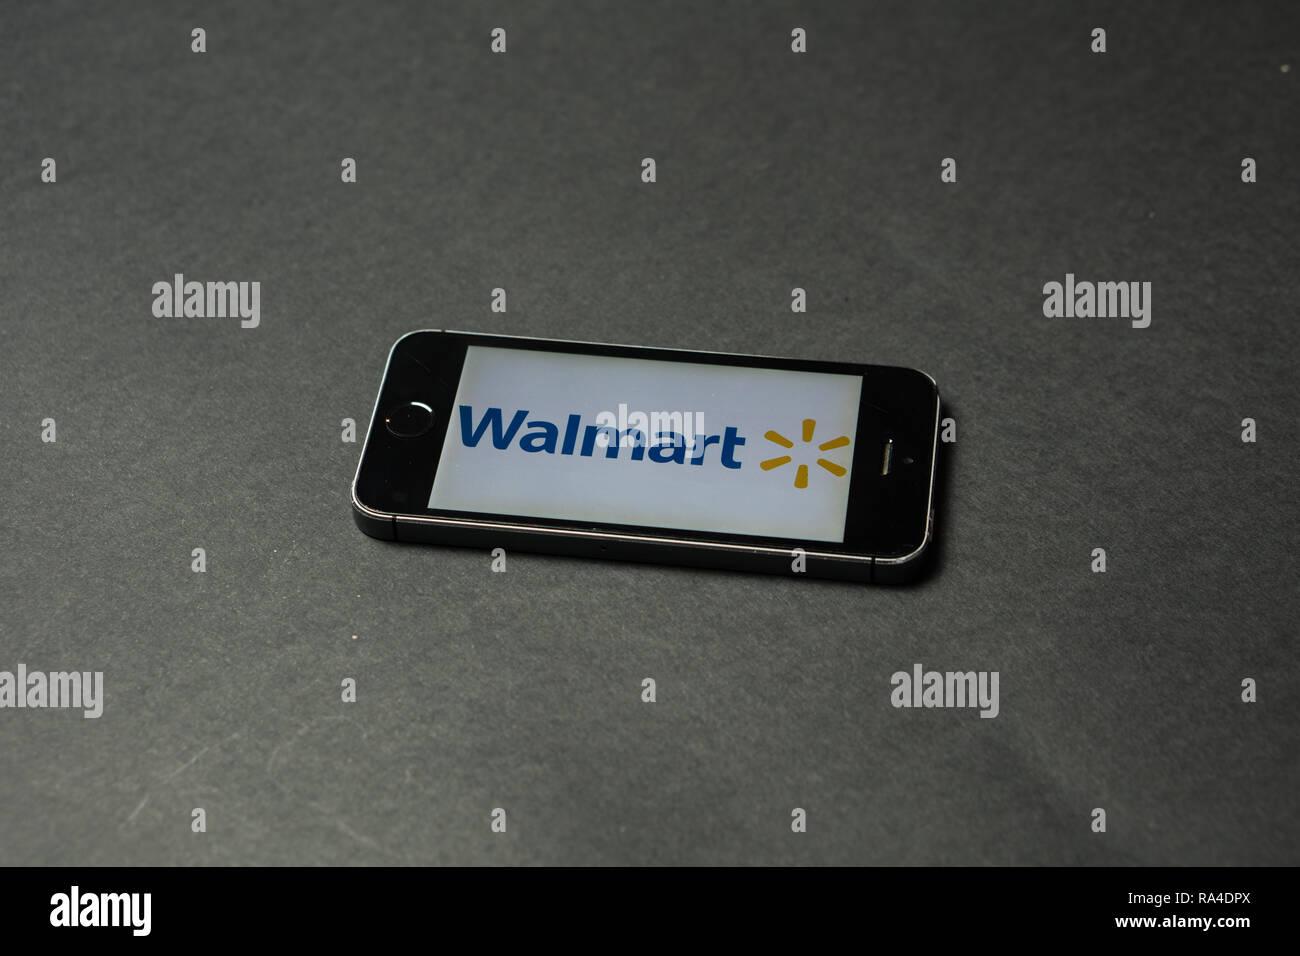 Walmart Stock Phone Number >> Walmart Logo On A Phone Screen Slovenia December 23th 2018 Stock